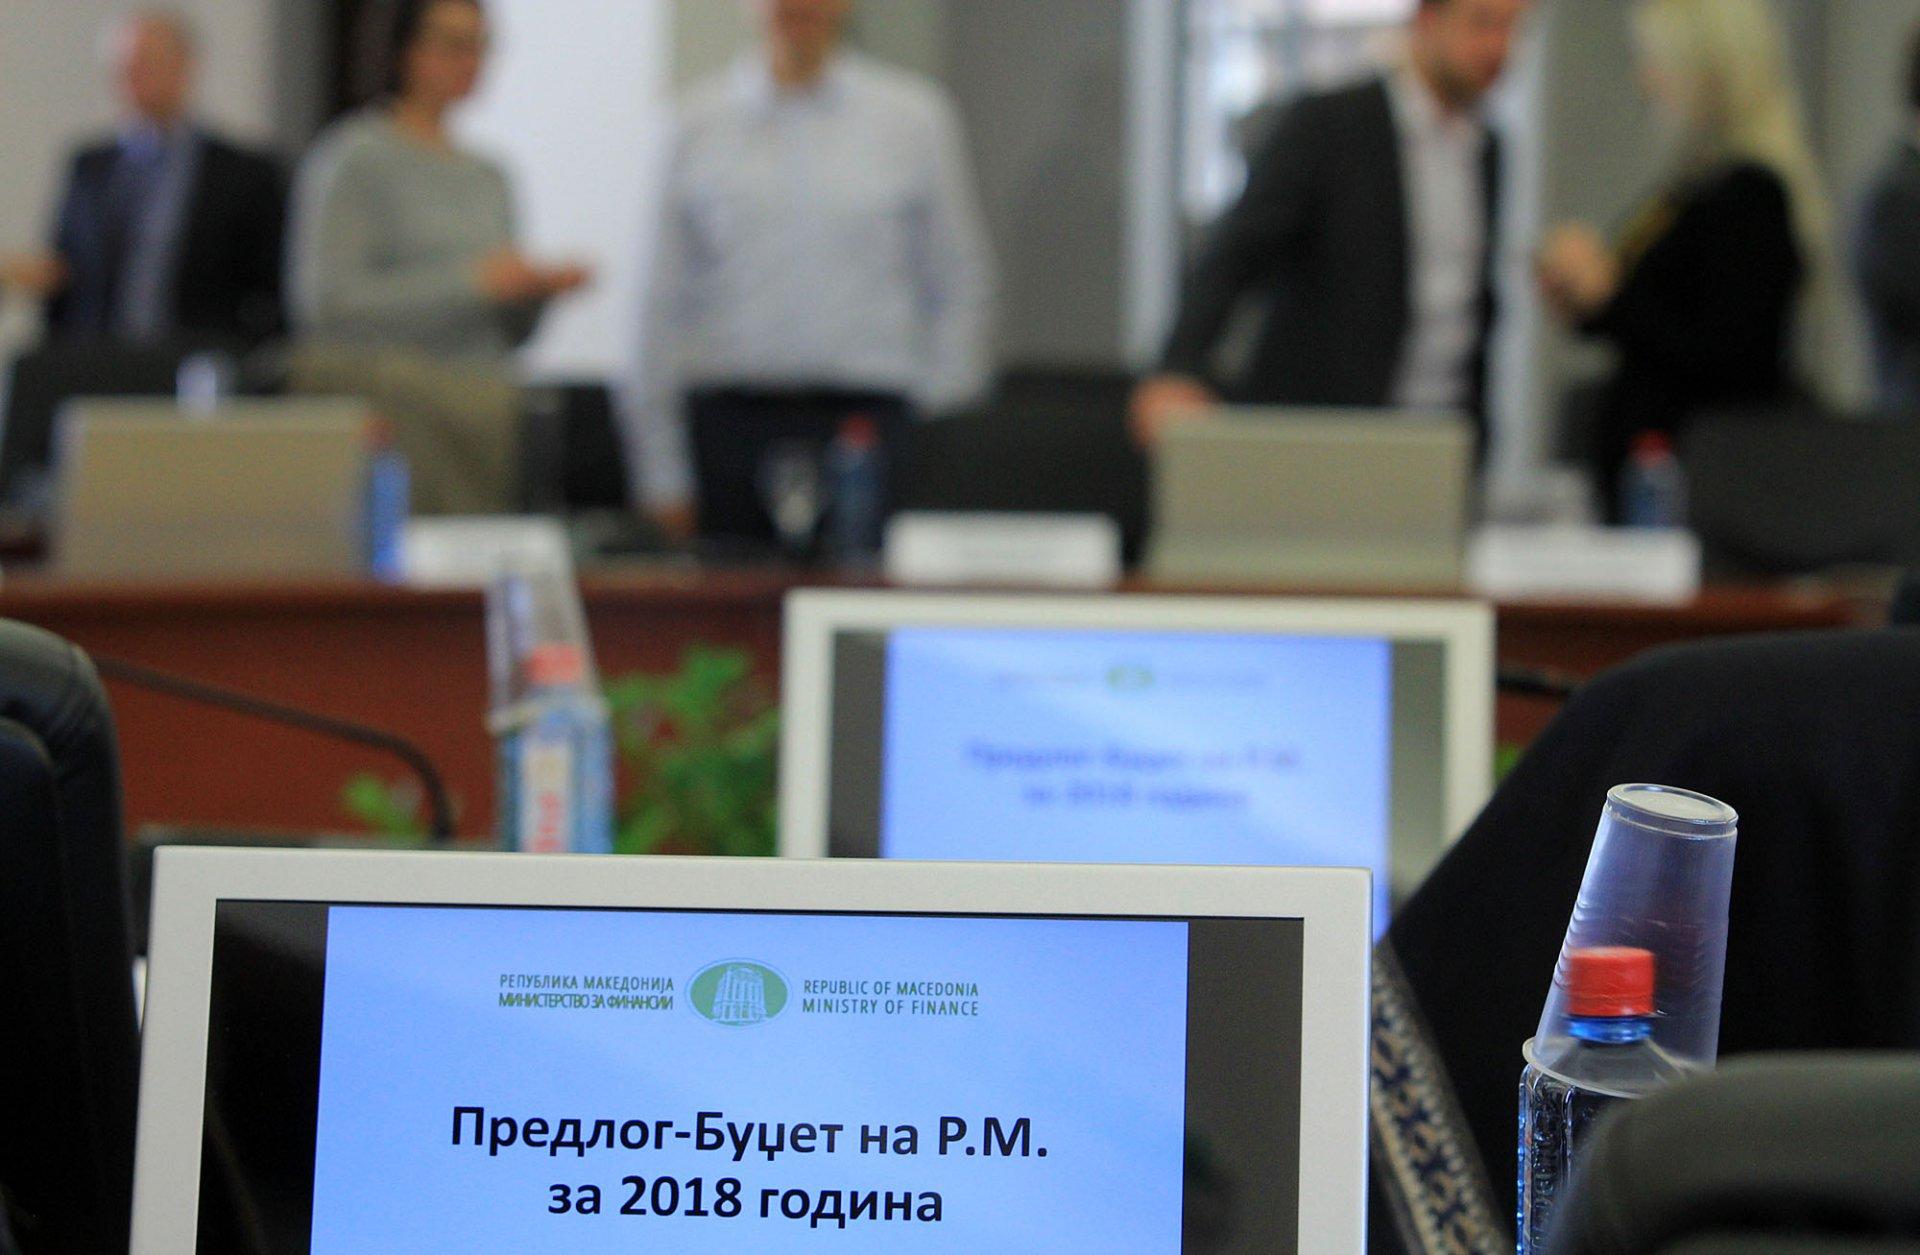 FYROM is planning to borrow 670 million euros in 2018